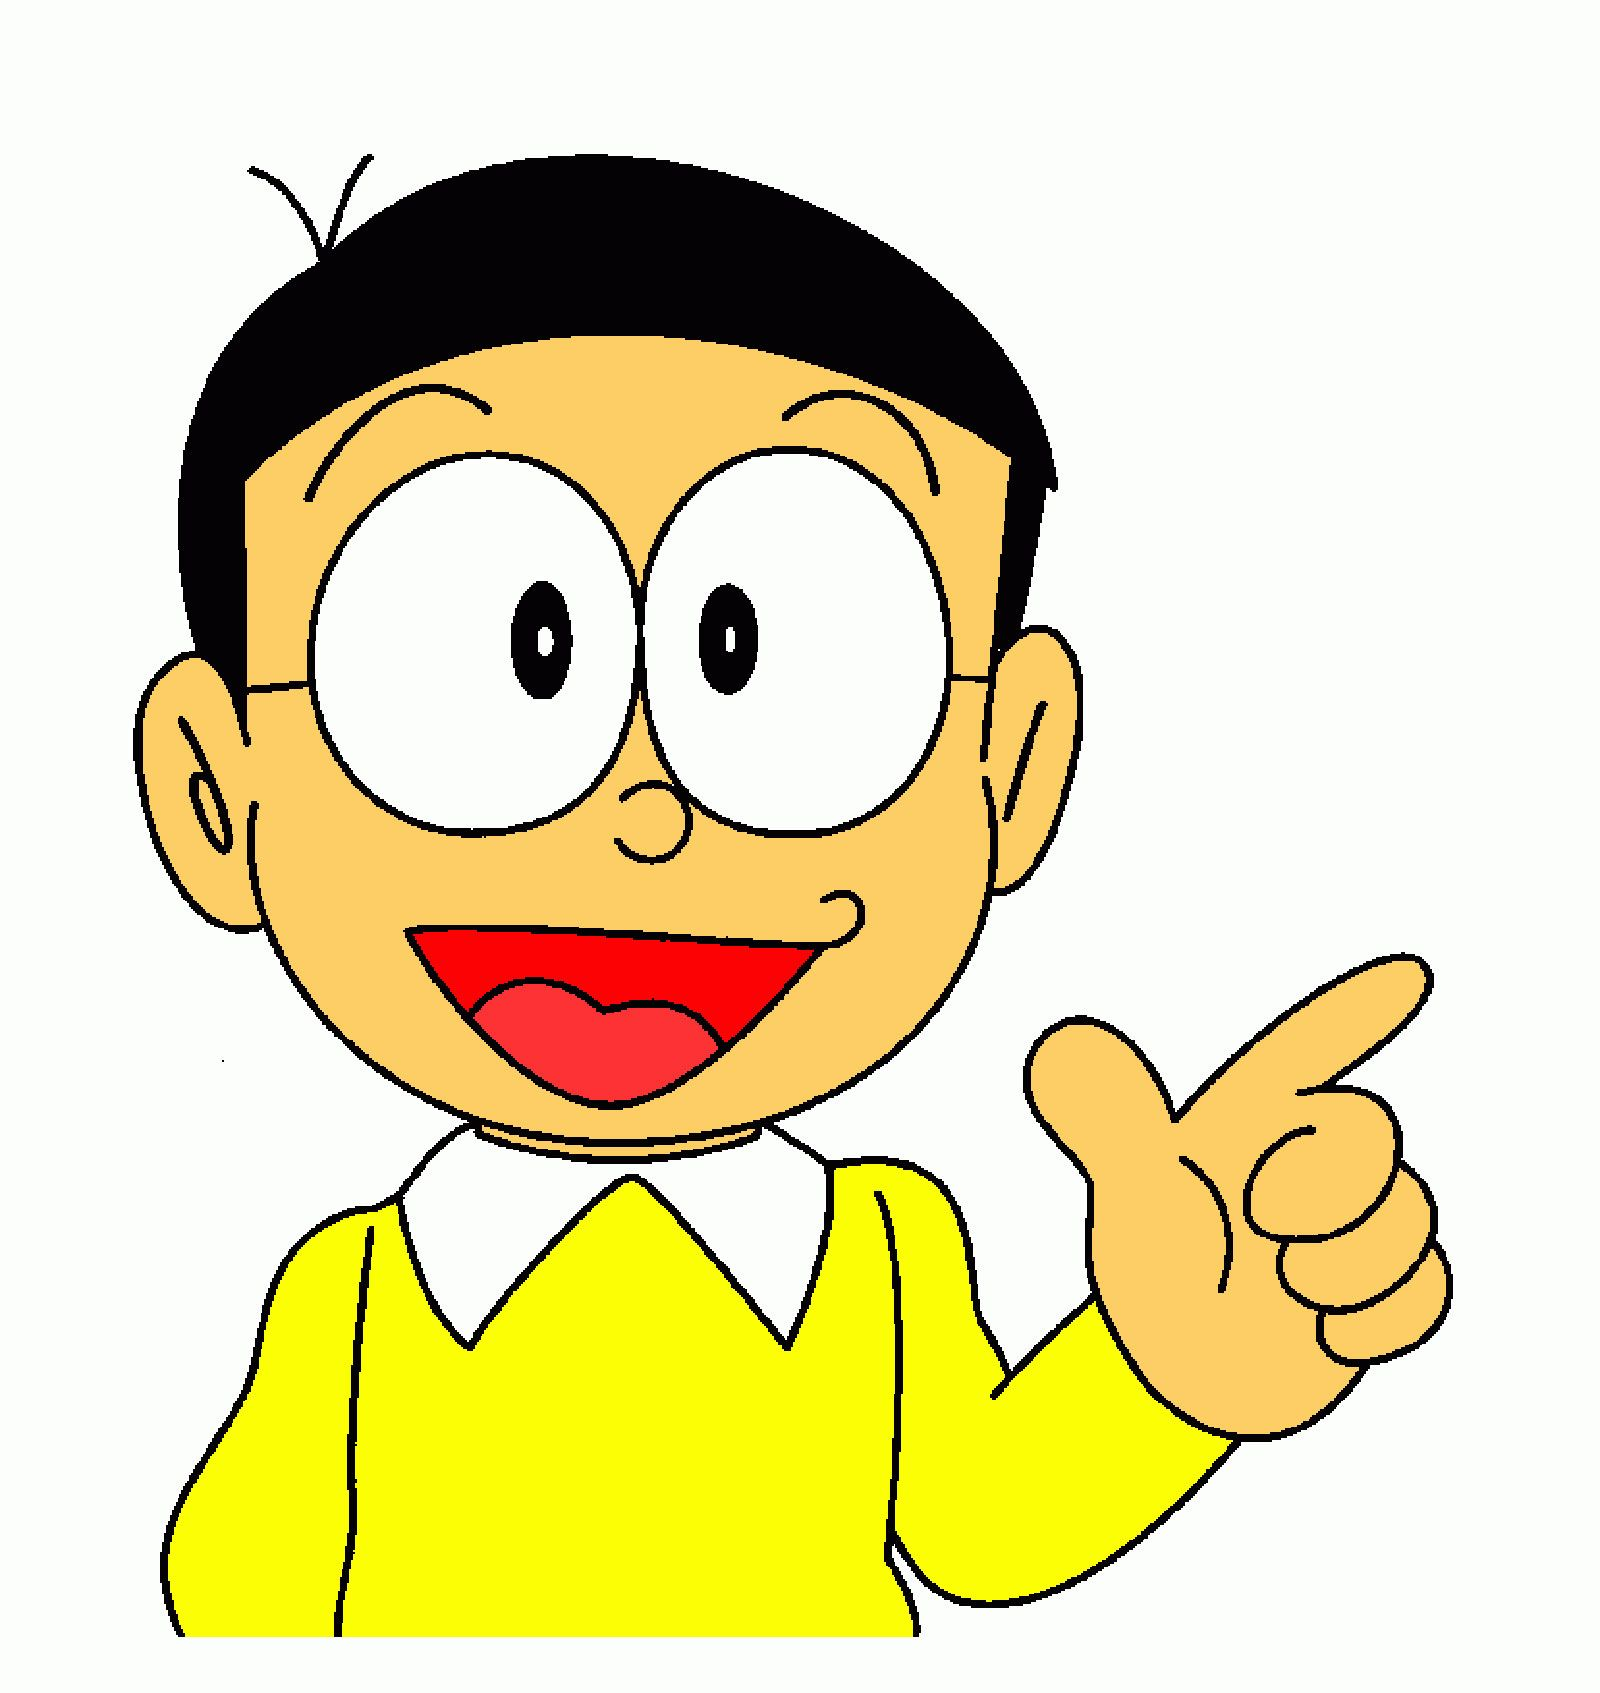 Doraemon Gambar,Nobita,Lucu,Rumah and Animasi HD